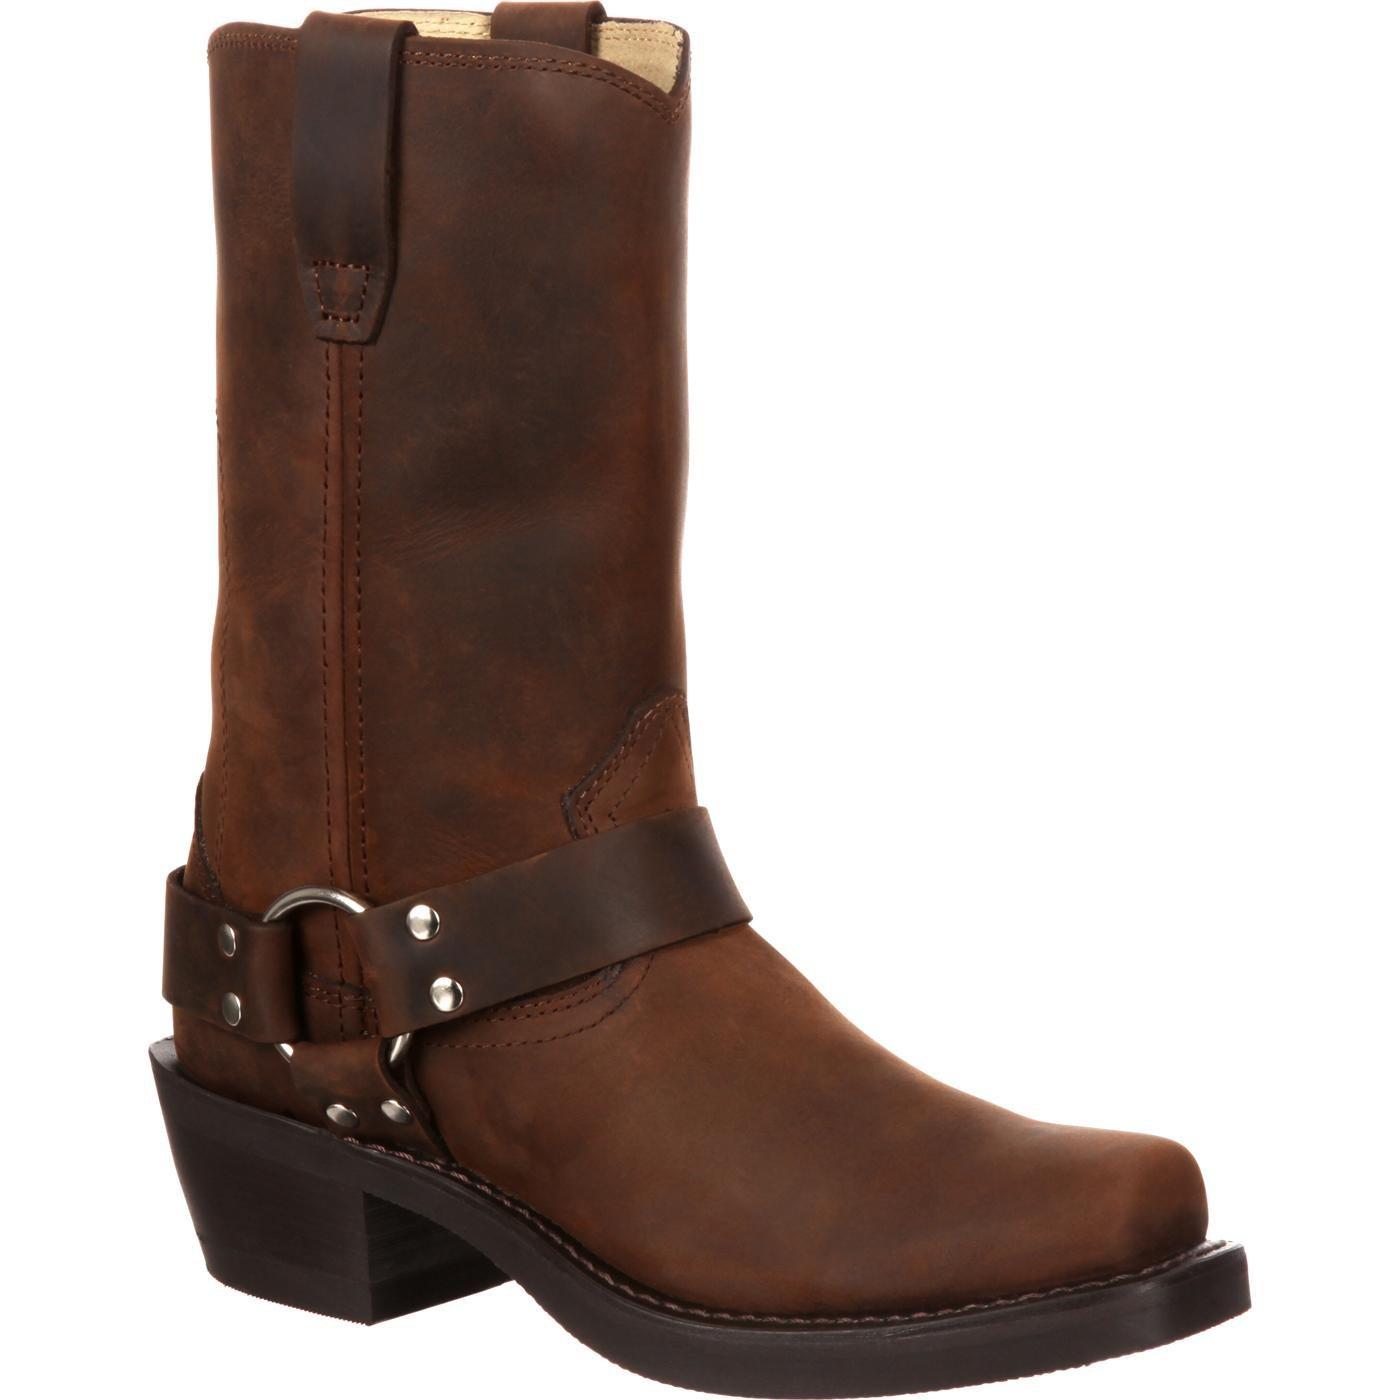 Durango Men's DB594 11'' Harness Boot Distressed Brown 9.5 D - Medium